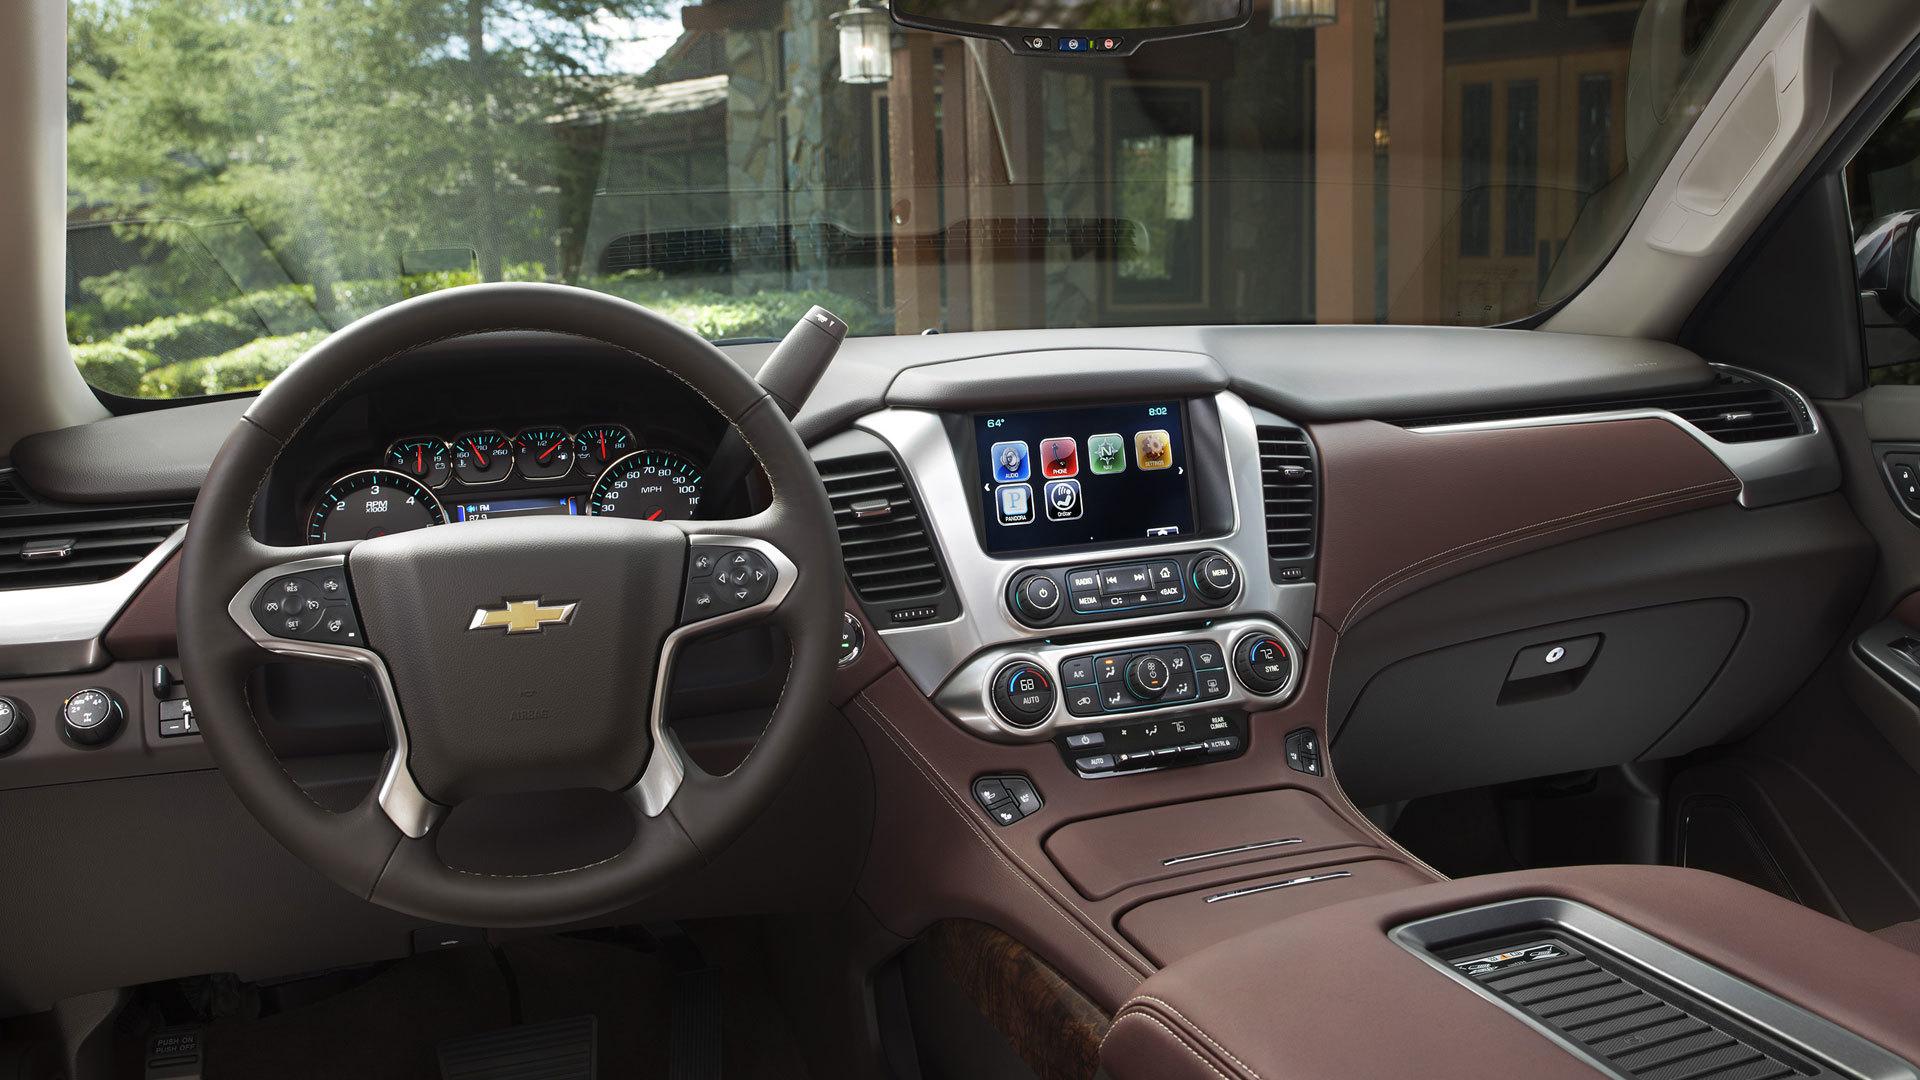 2019 Chevrolet Equinox Oil Capacity | 2019 - 2020 GM Car ...